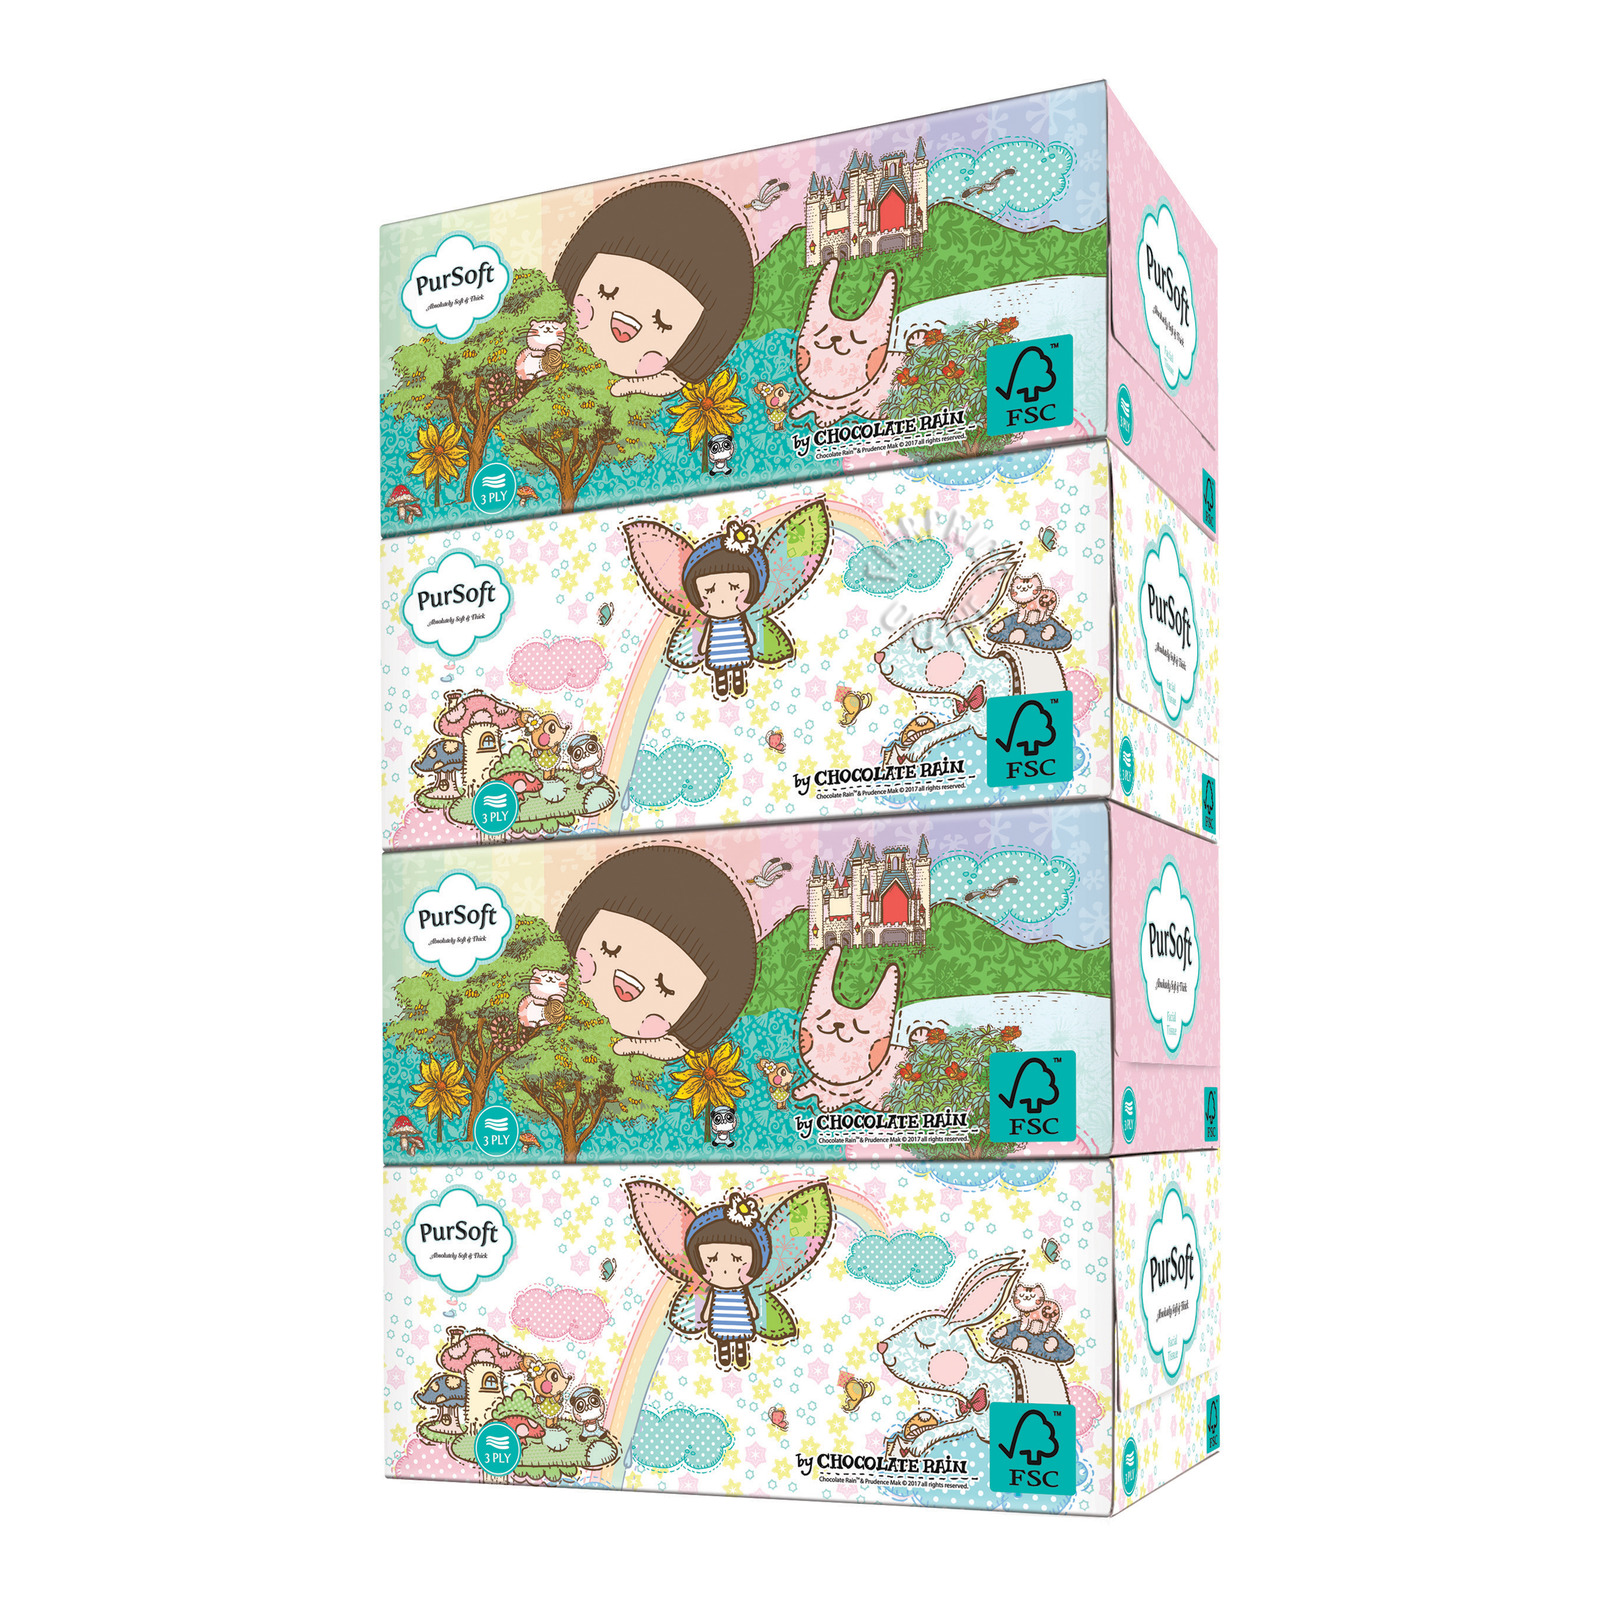 PurSoft Facial Tissue Box - Fantasy (3ply)